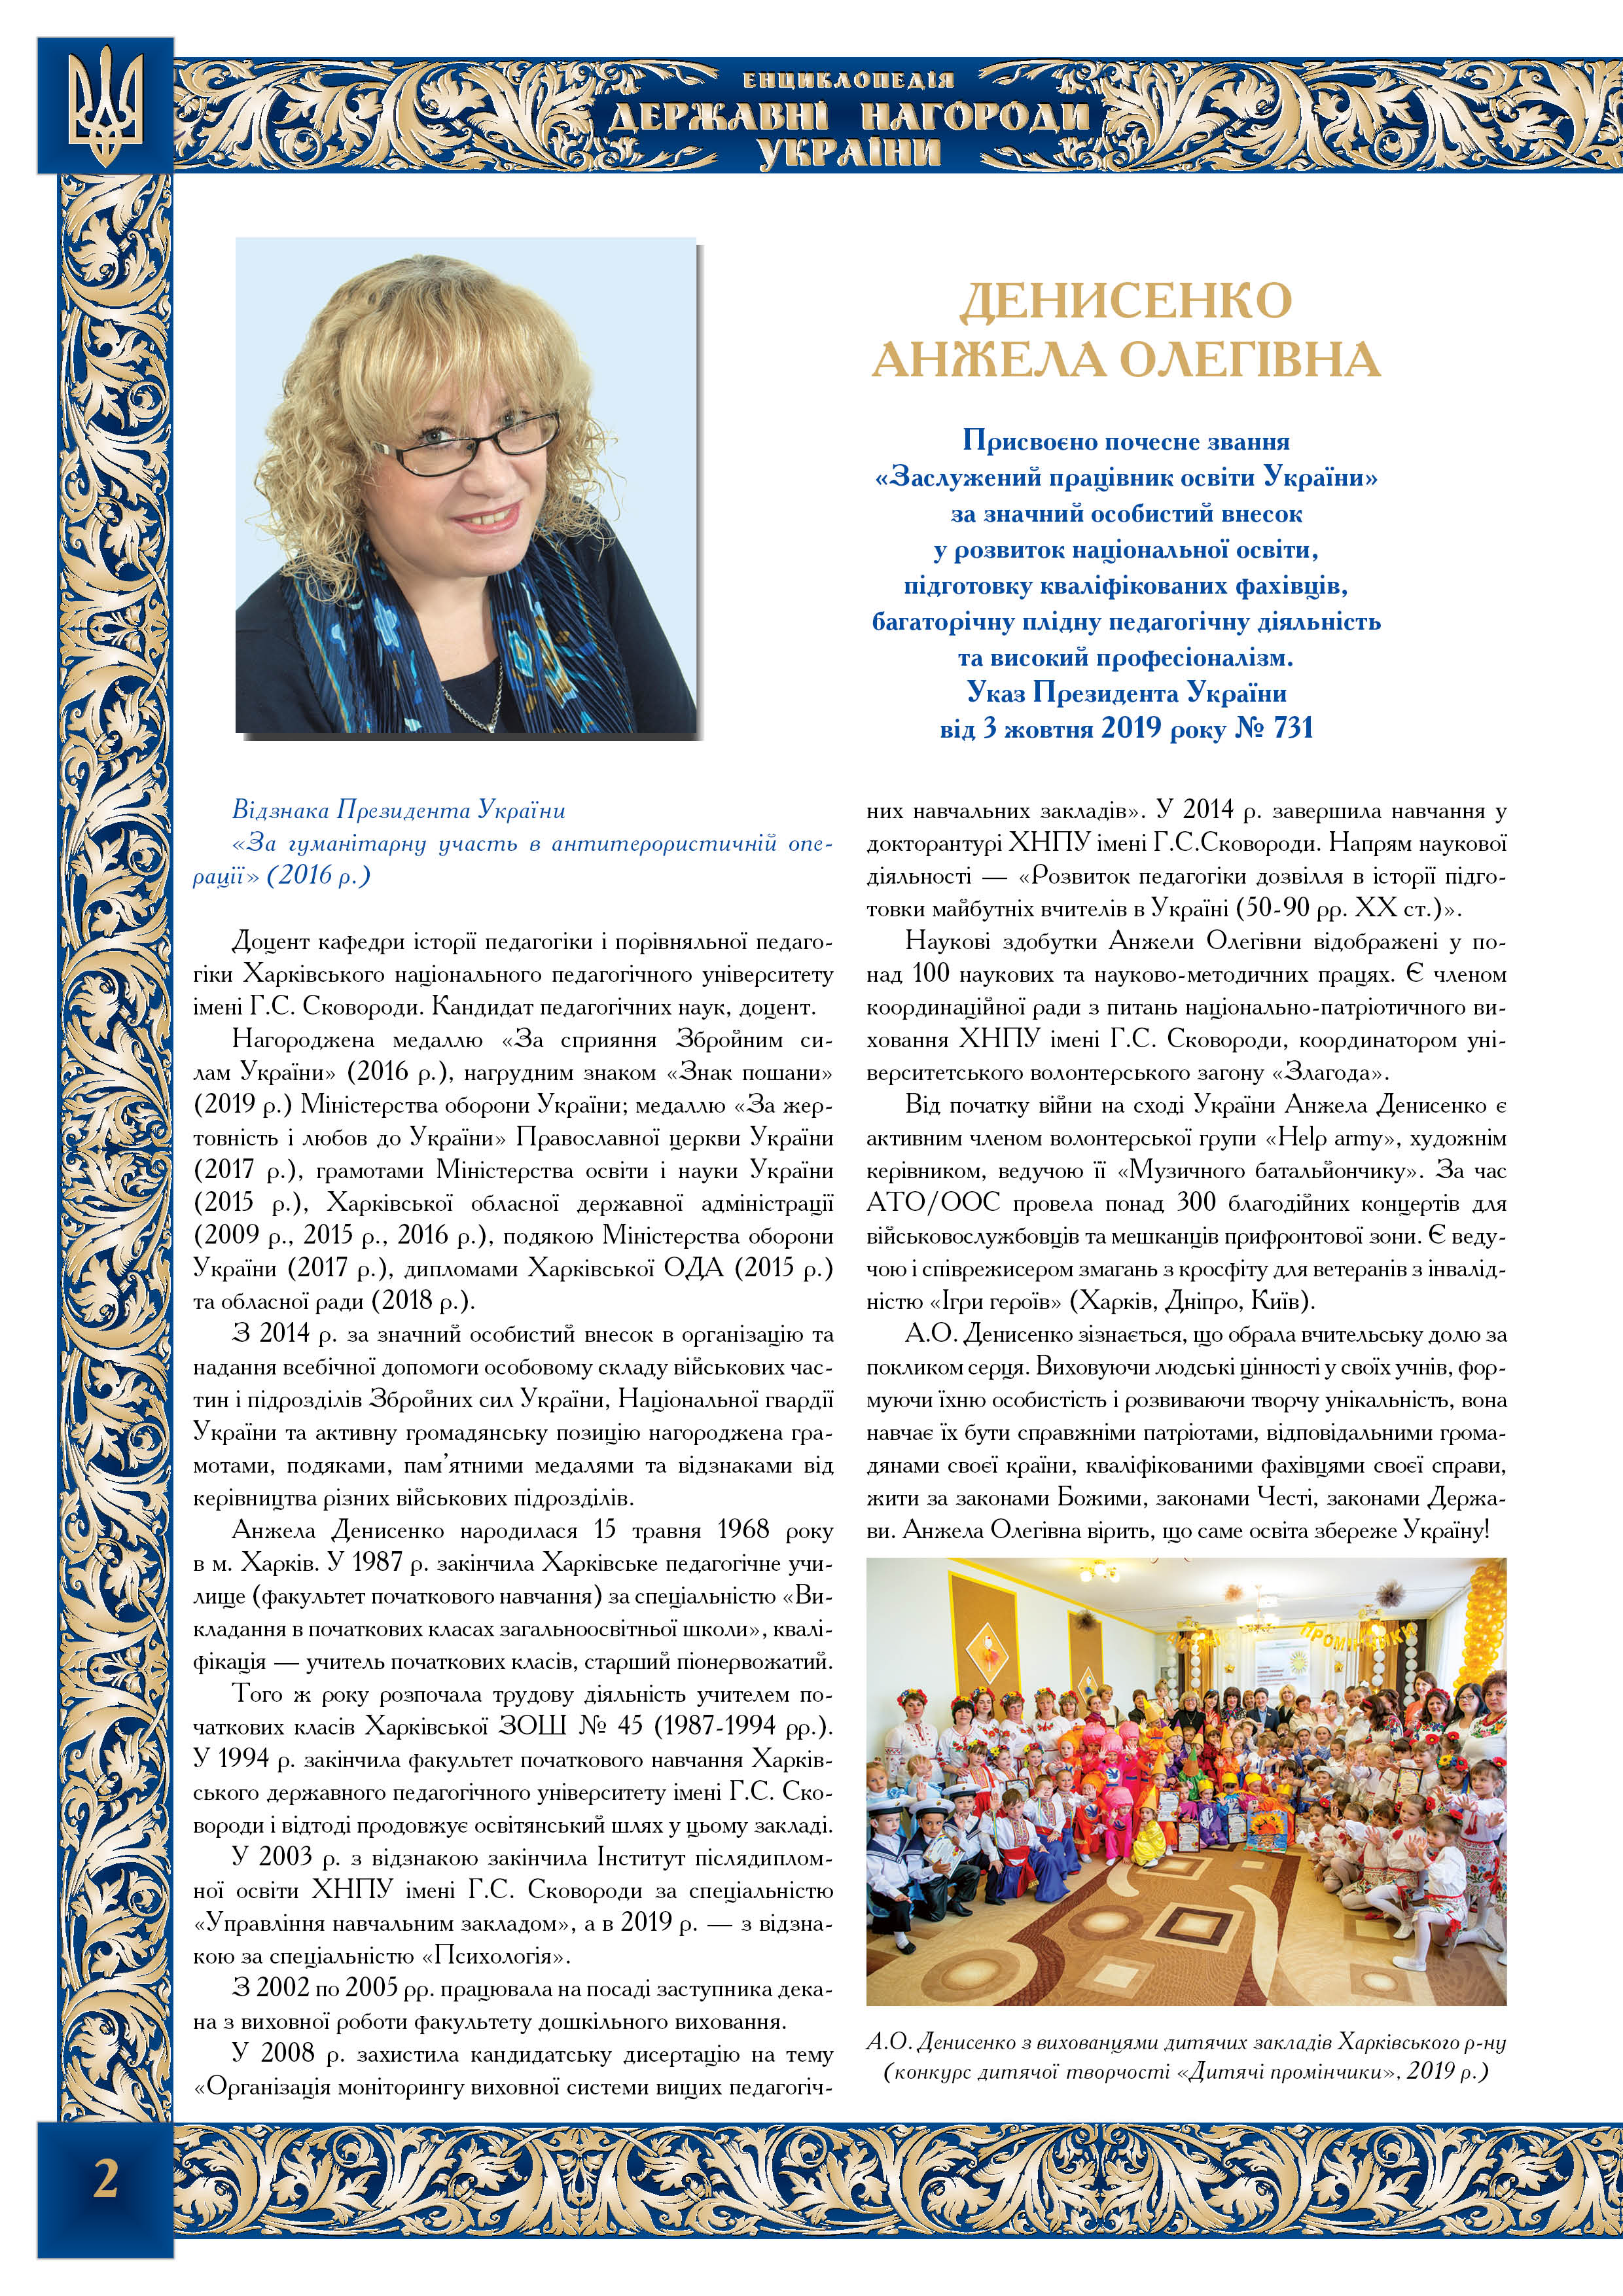 Денисенко Анжела Олегівна